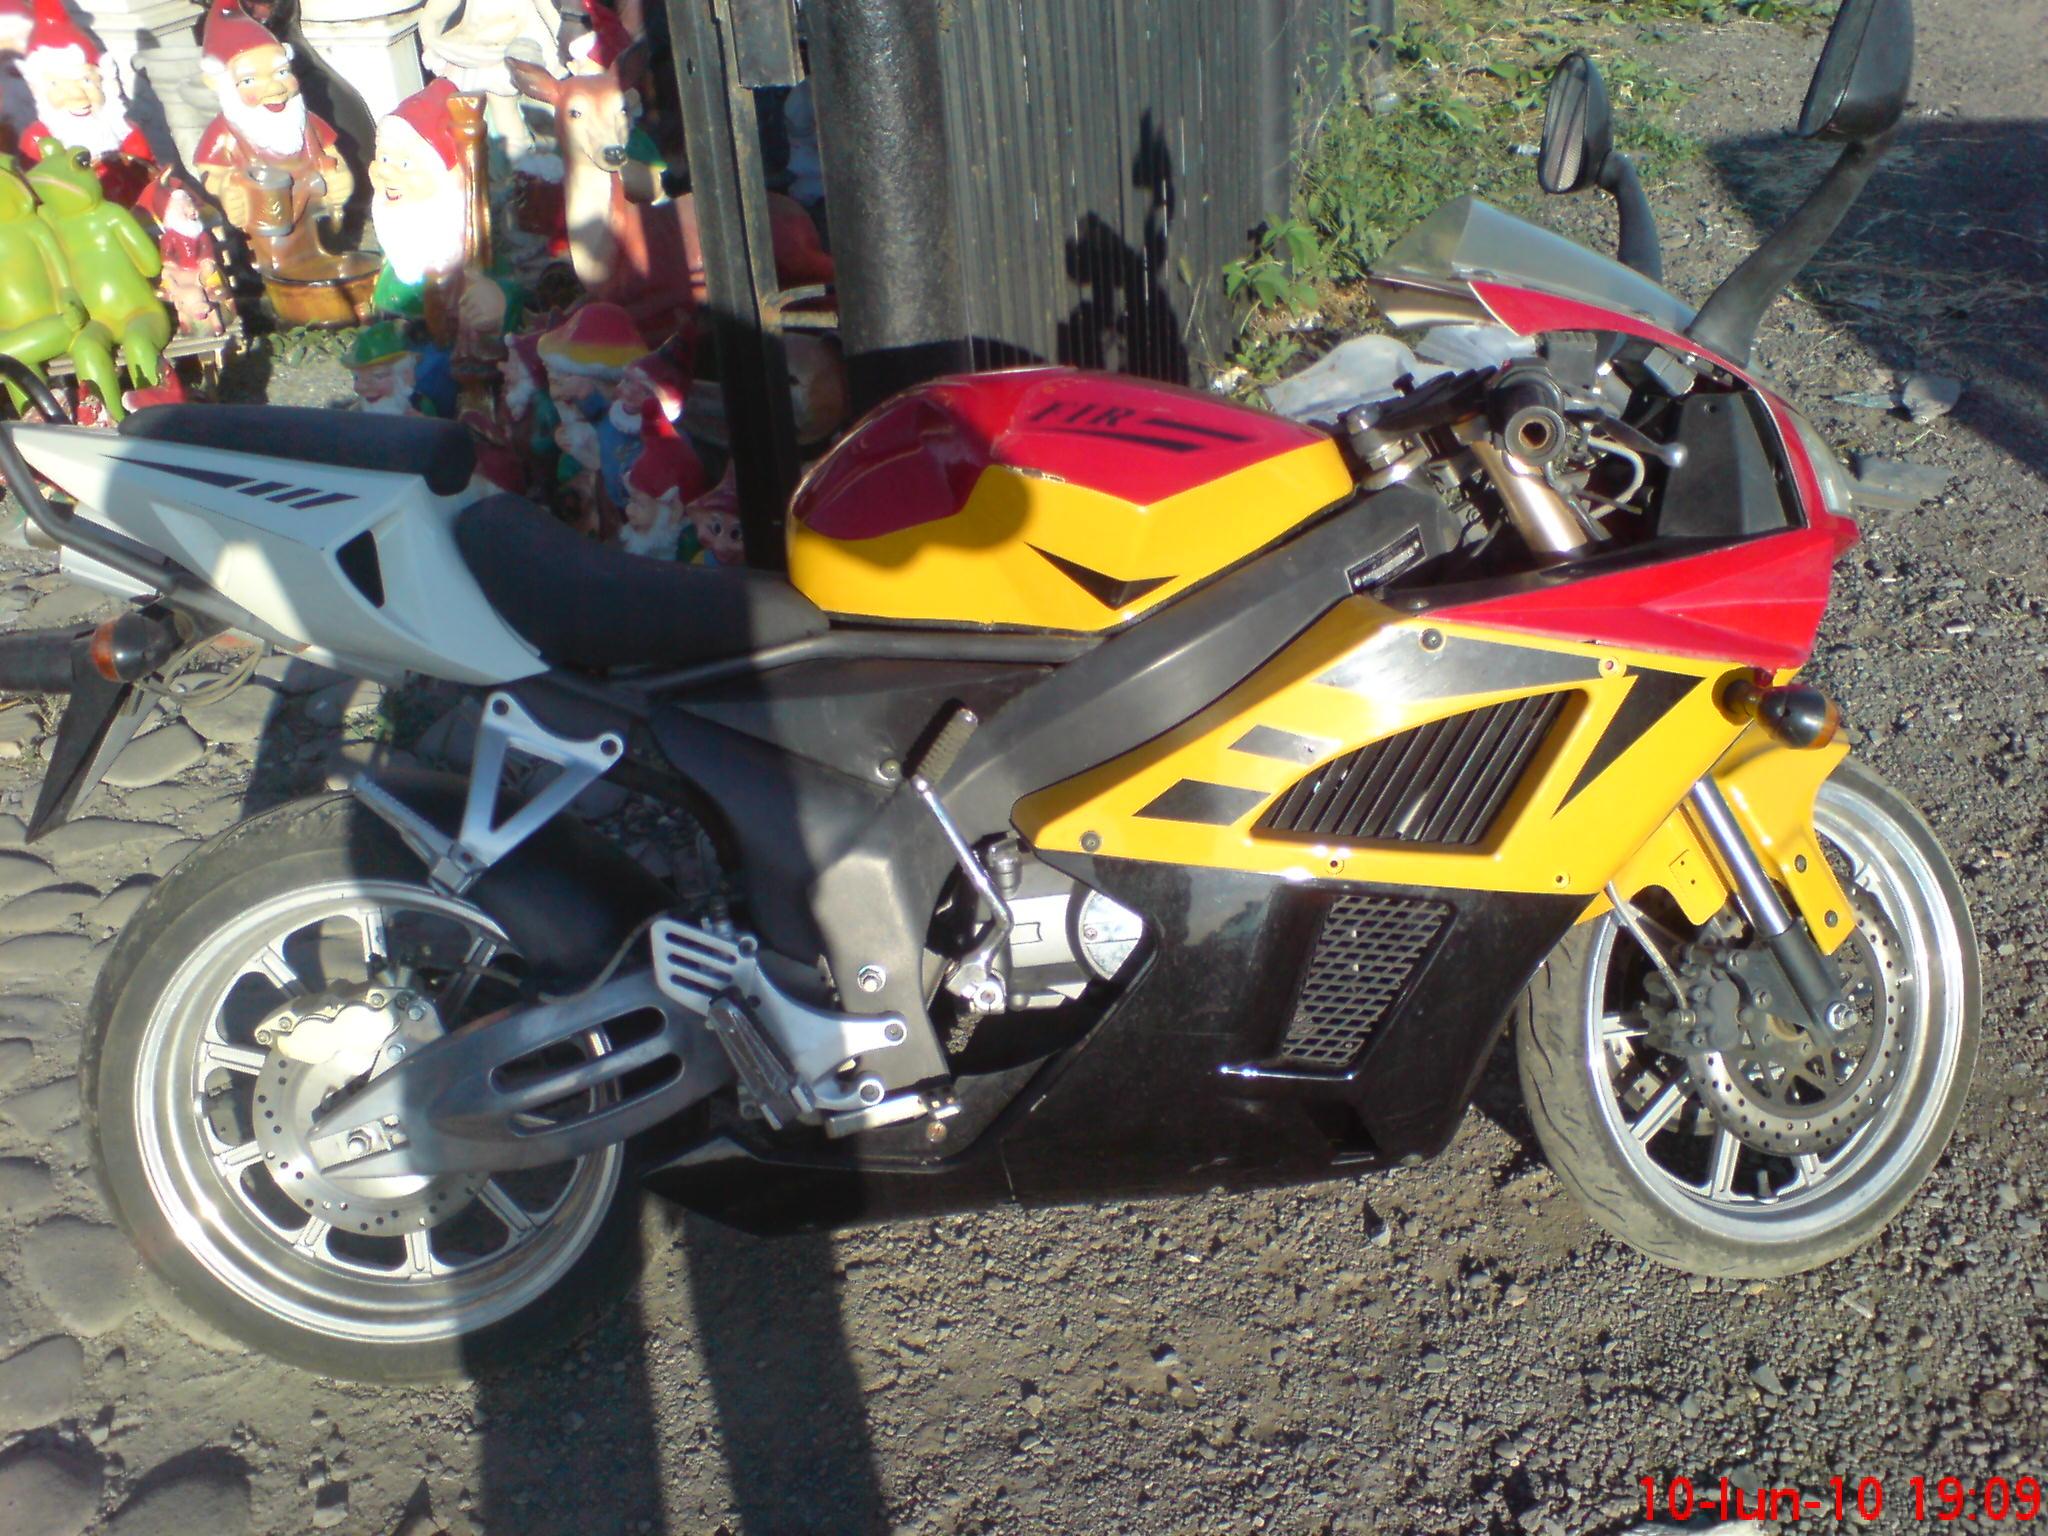 motor kina 1200 euro 125cc 0729680999 !!!super pret!!! reducere!!! Pret nou 1000 euro